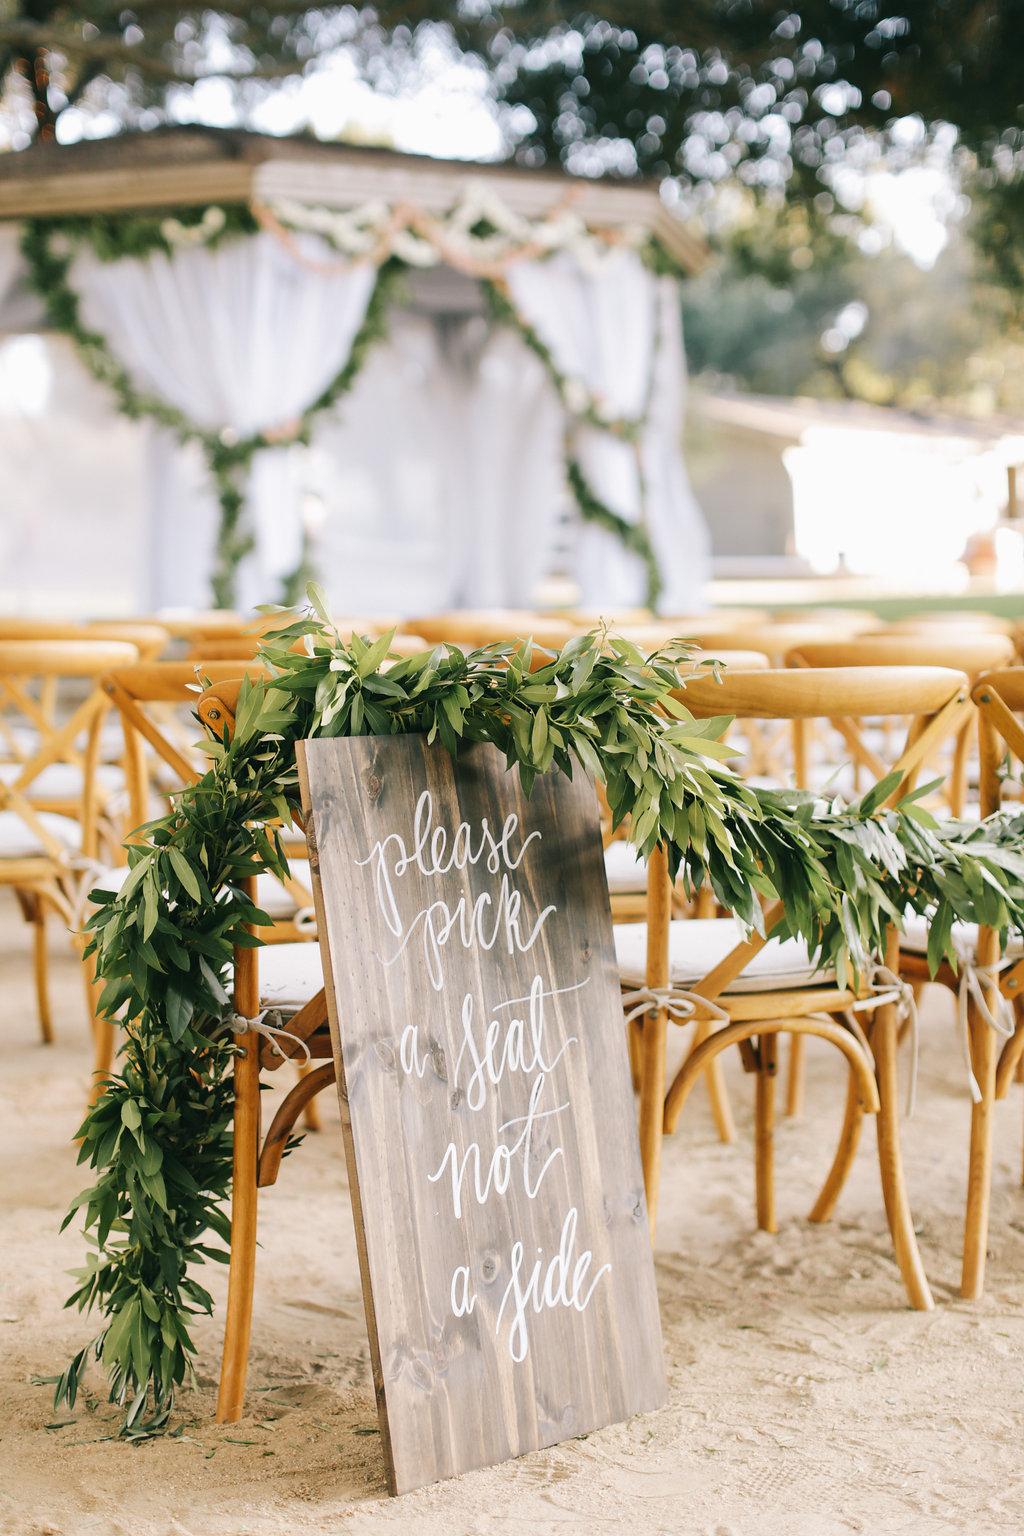 LVL Weddings and Events Brandon Kidd Equestrian Wedding (162).jpg